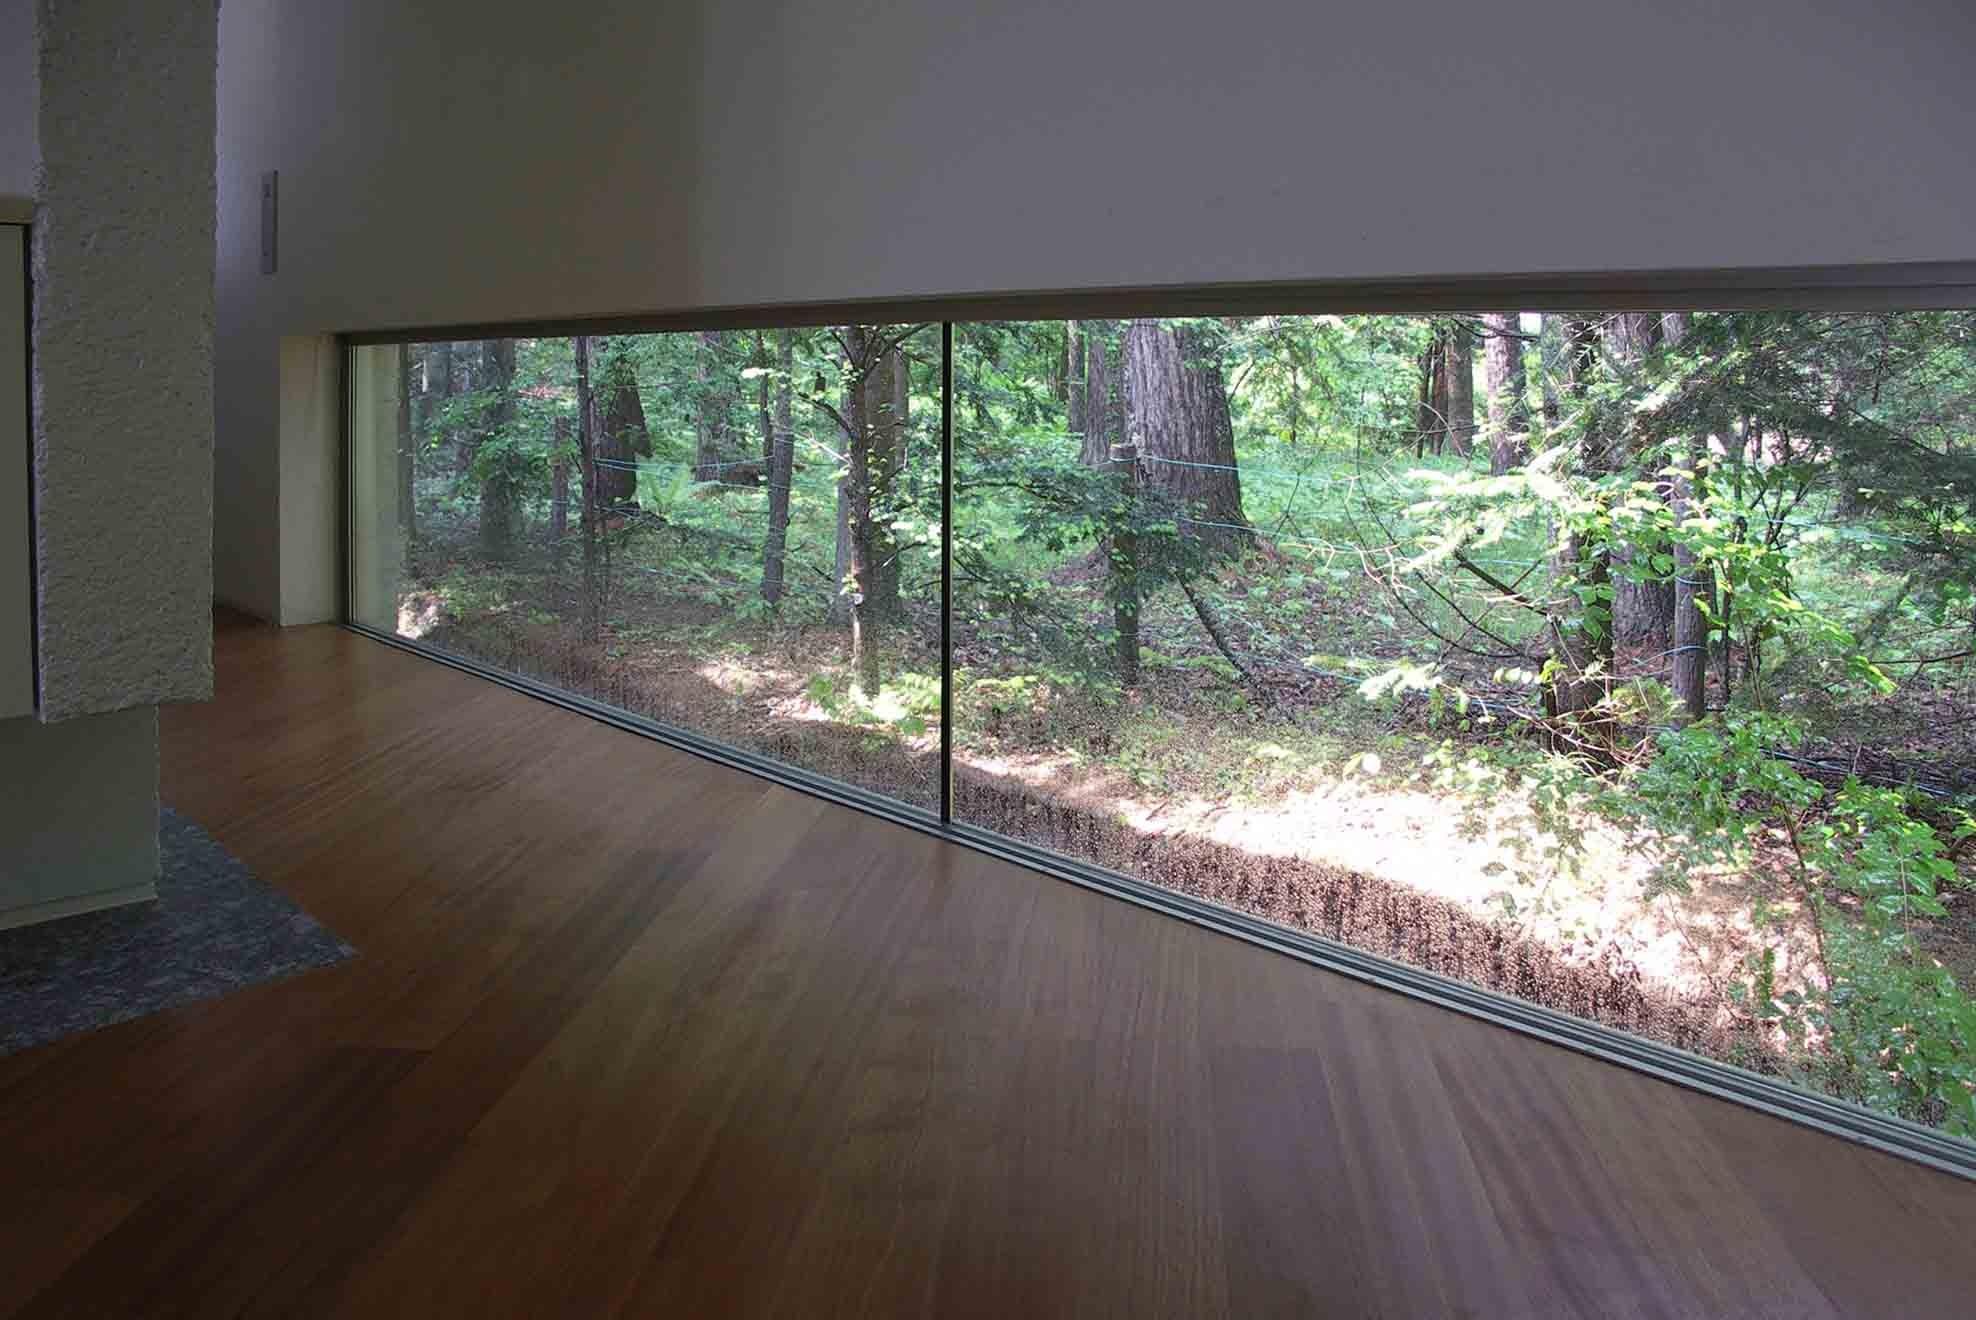 VILLA NAKAKARUIZAWA (エントランスホール突き当りの地窓からは隣地の広大な原生林が借景として見えるようになっている)